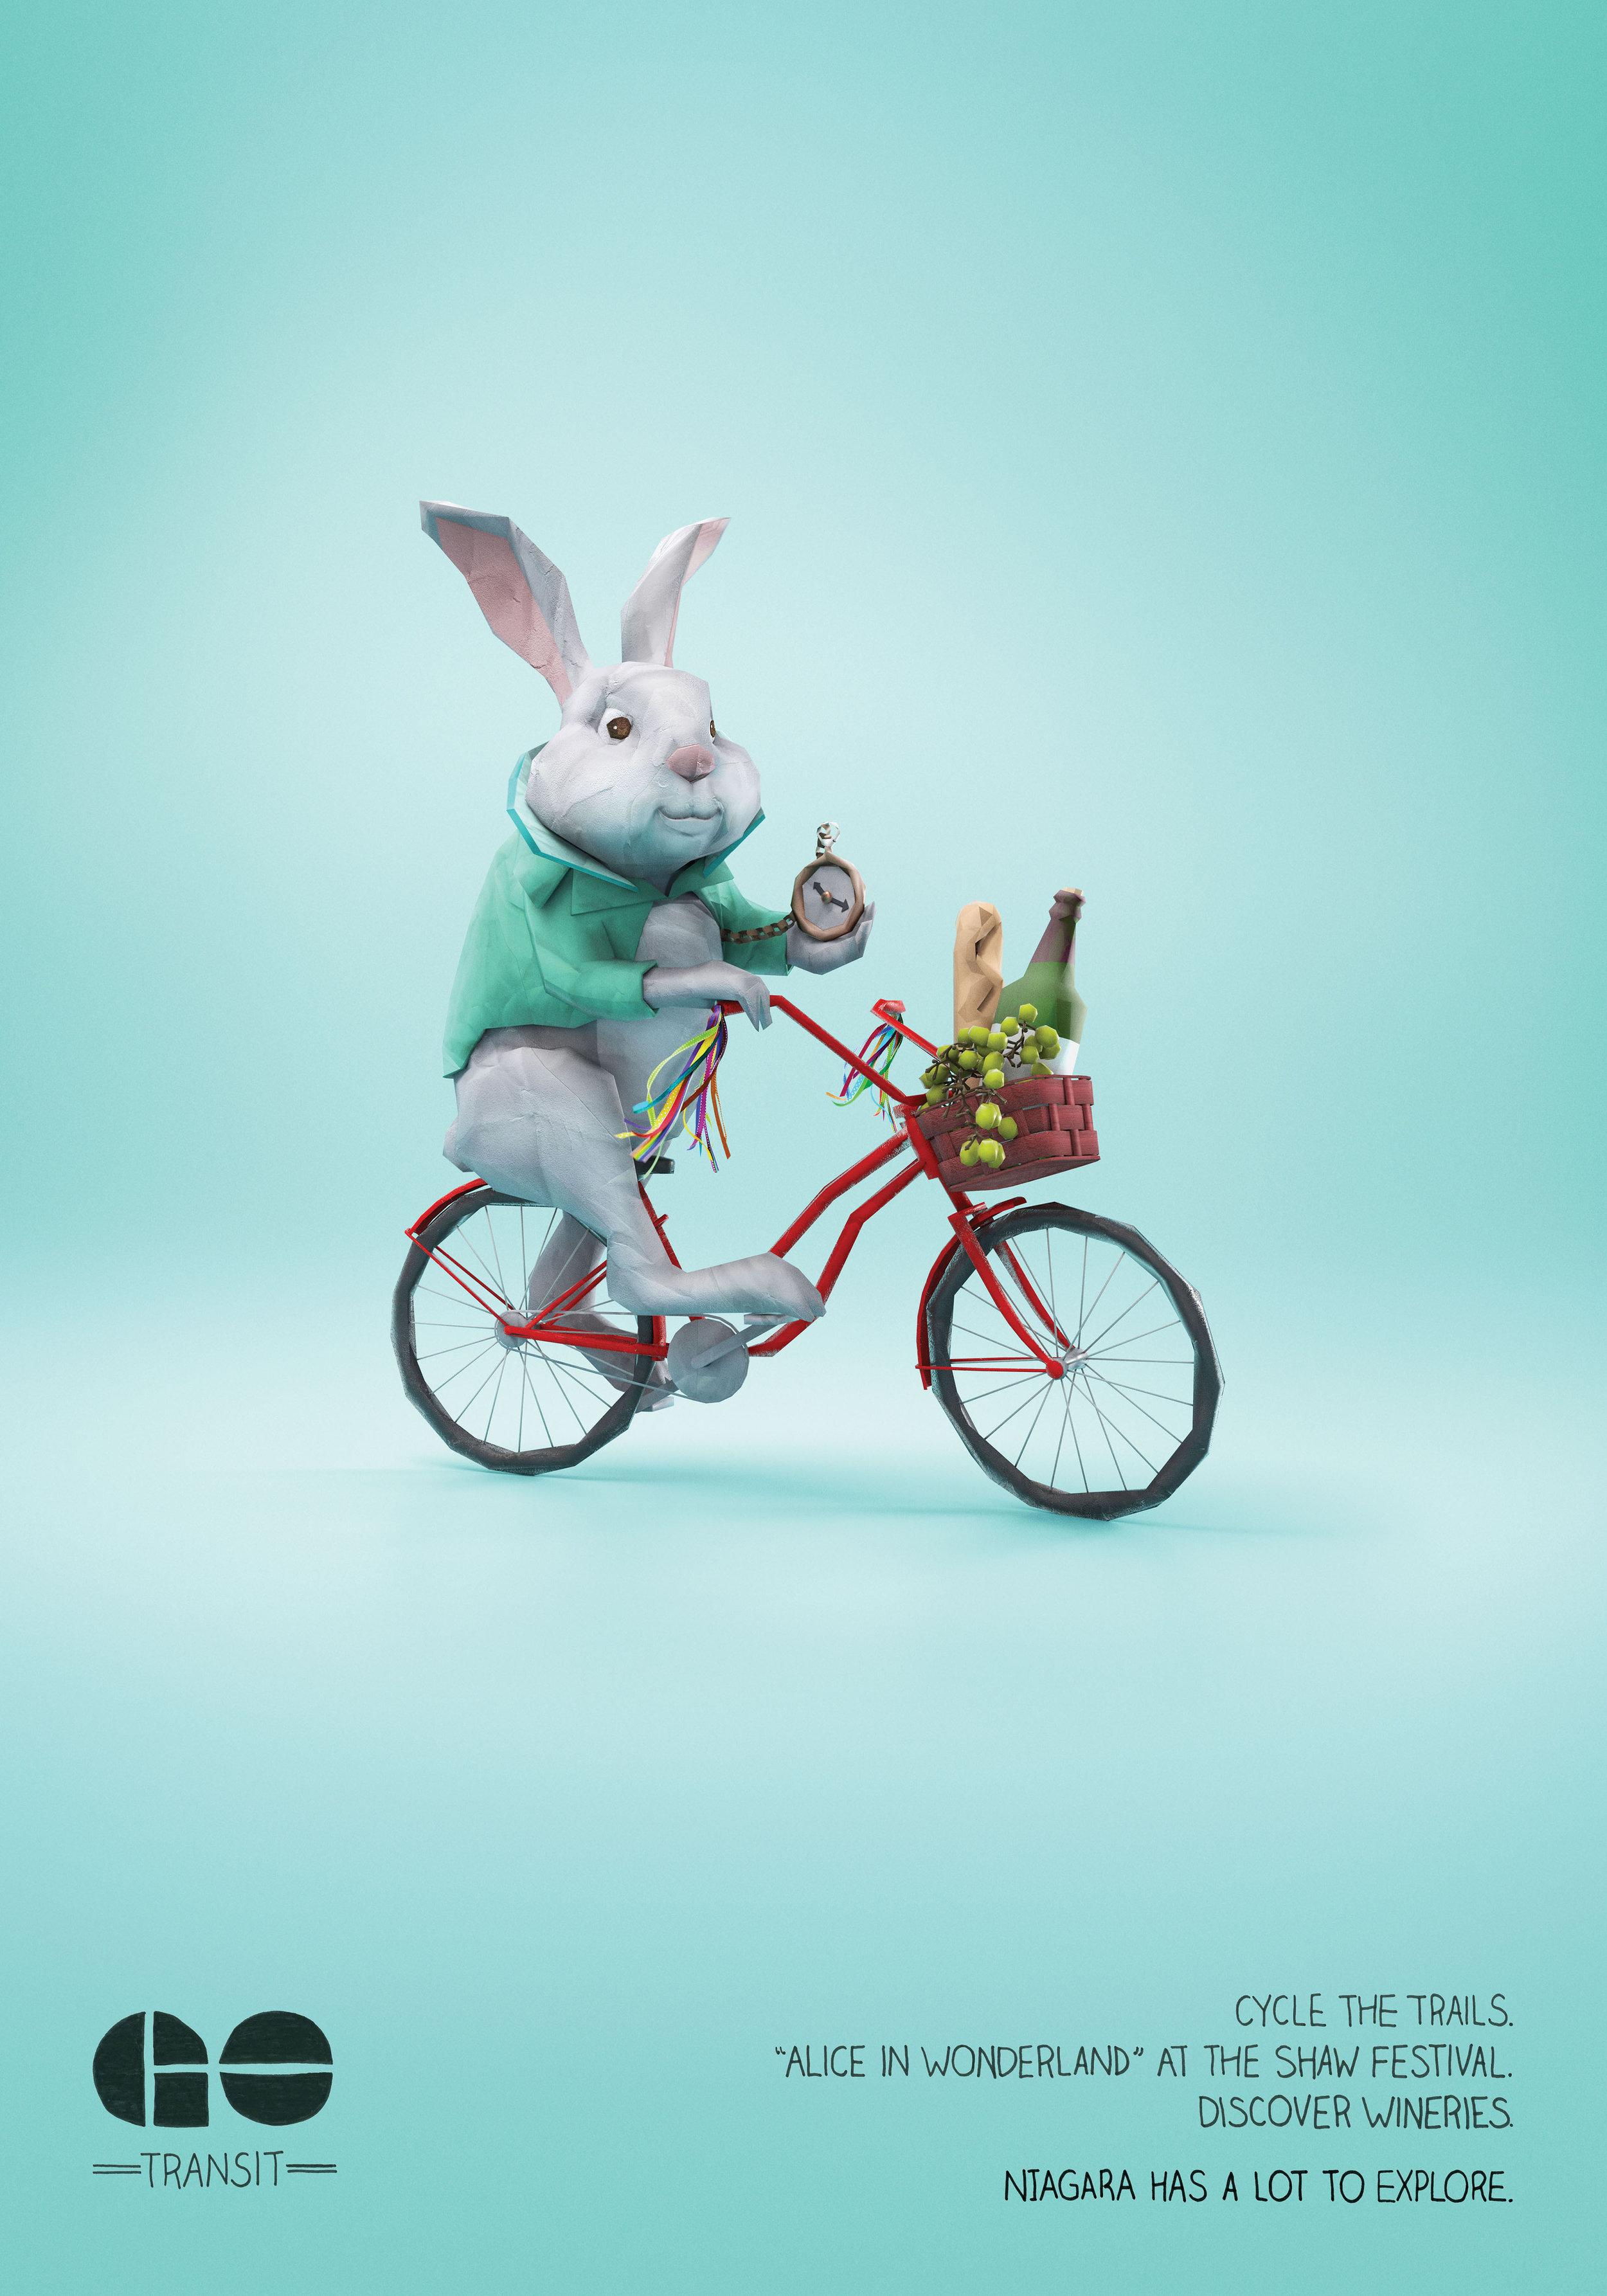 Applied Arts Photo / Illustration award winner   Client • Go Transit  Agency • DDB Canada  Art Director • Becky May  CGI • Brad Pickard